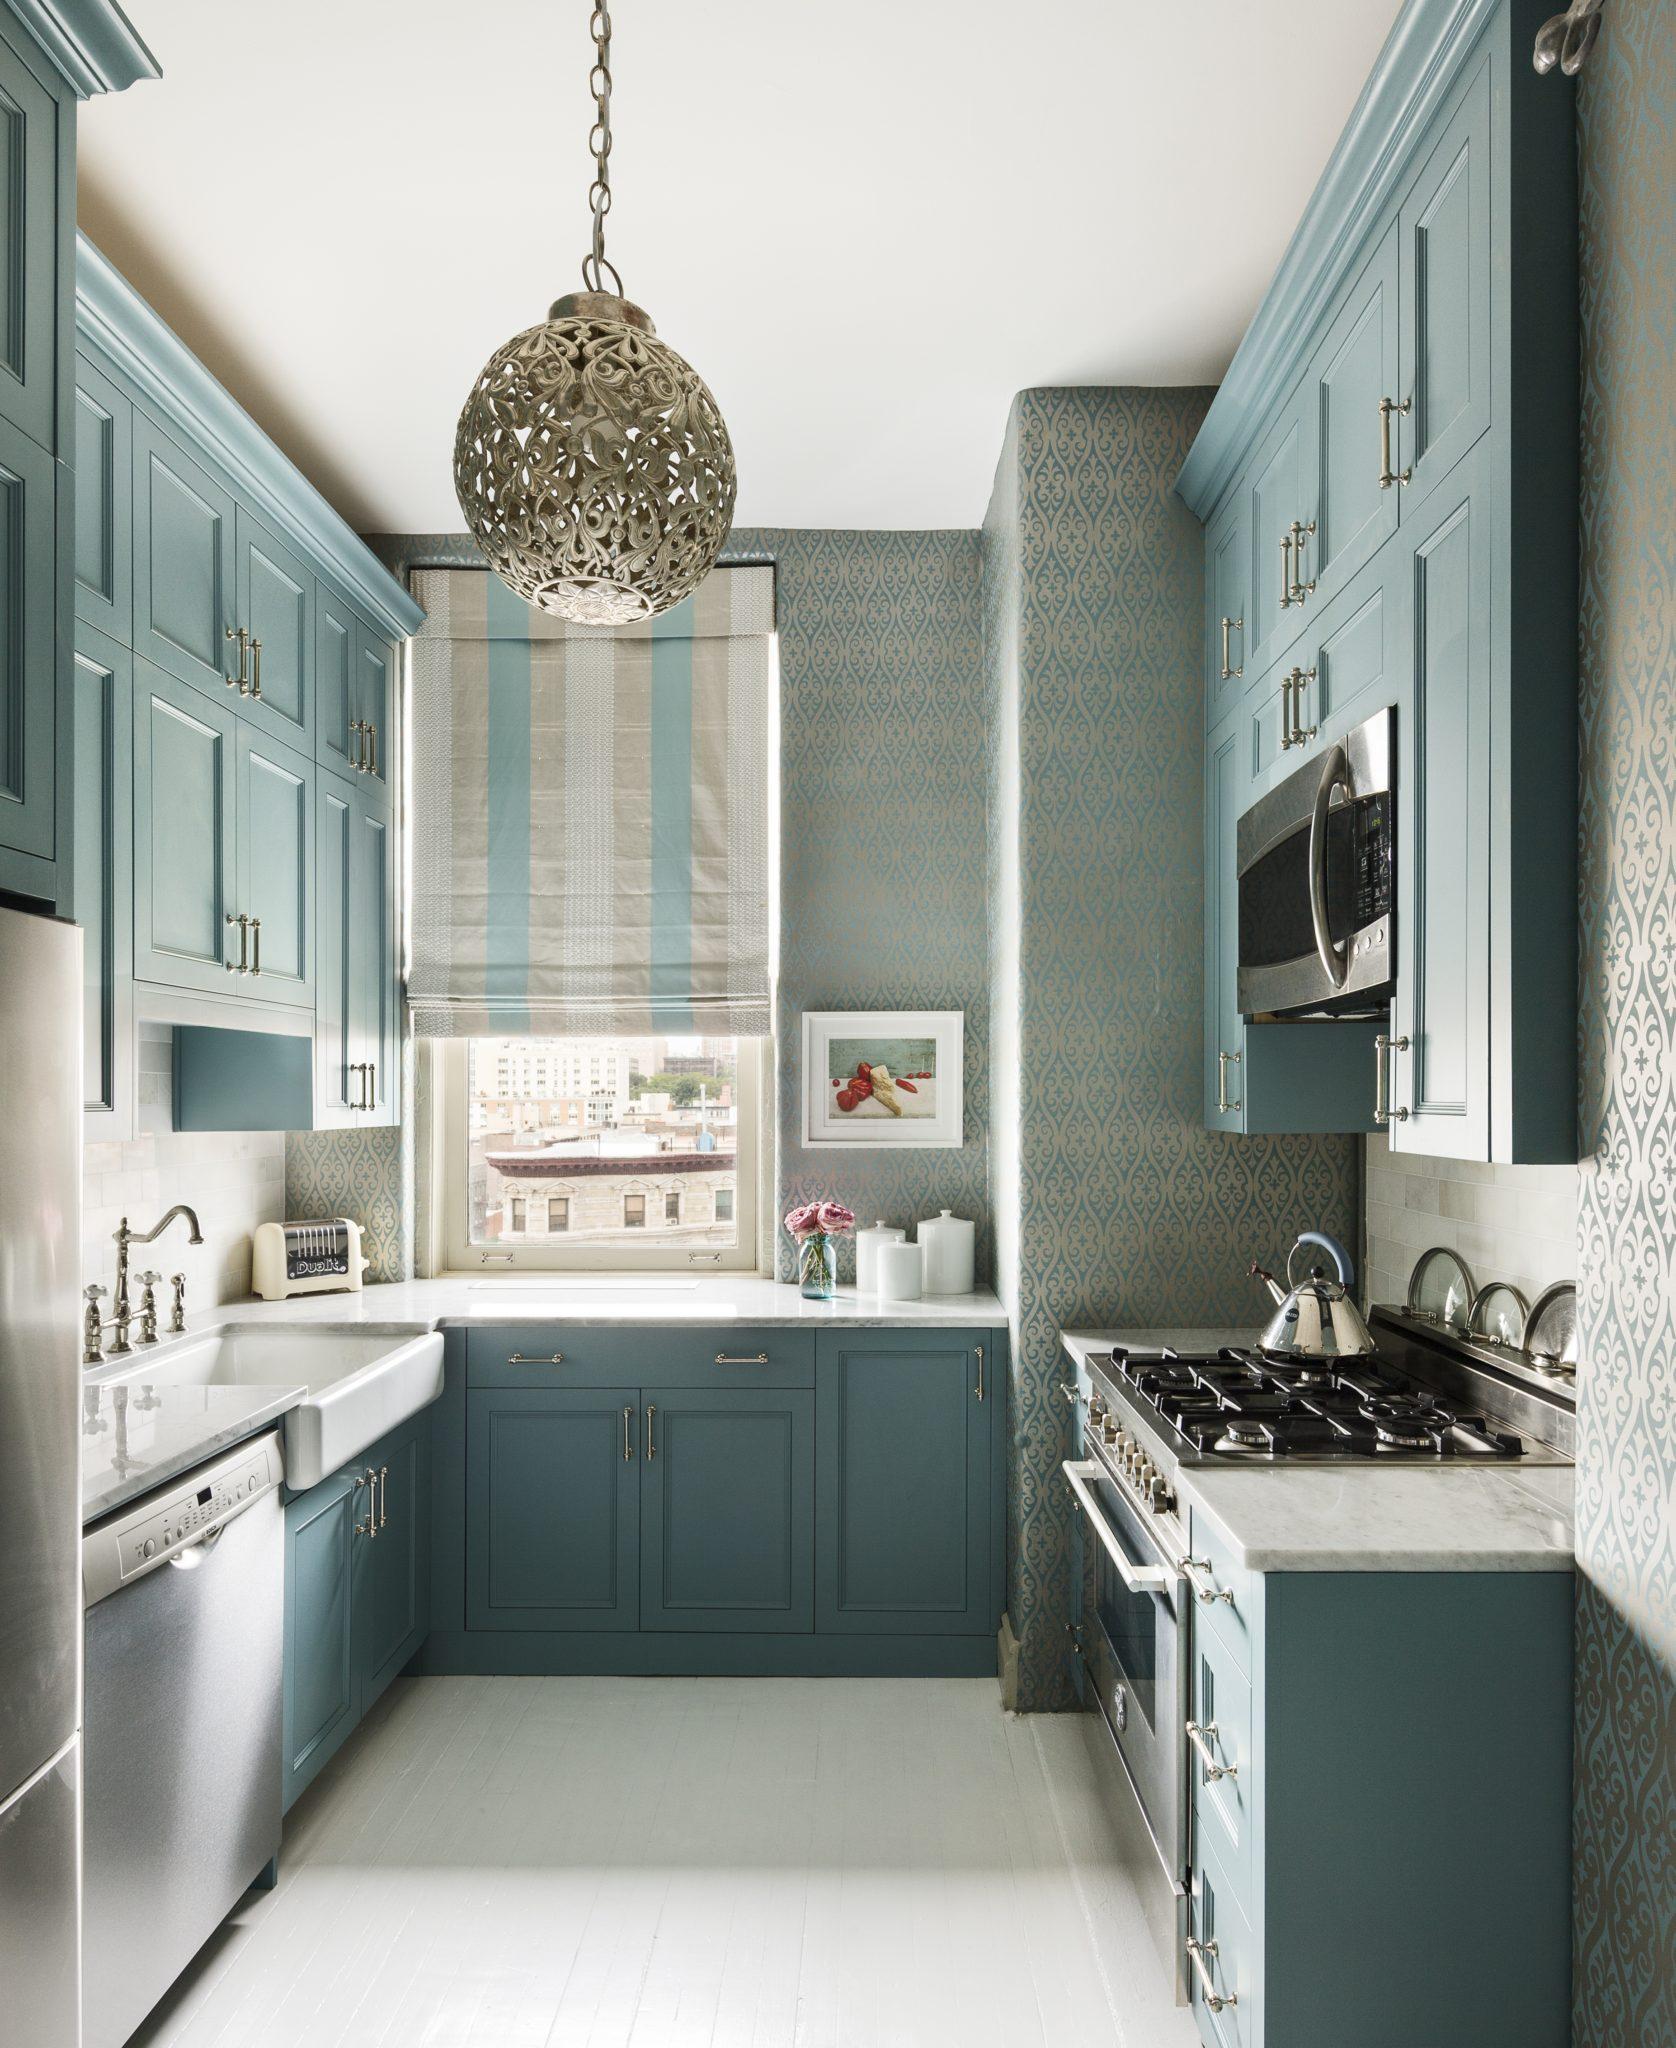 Harlem Landmark Kitchen by Sheila Bridges Design Inc.